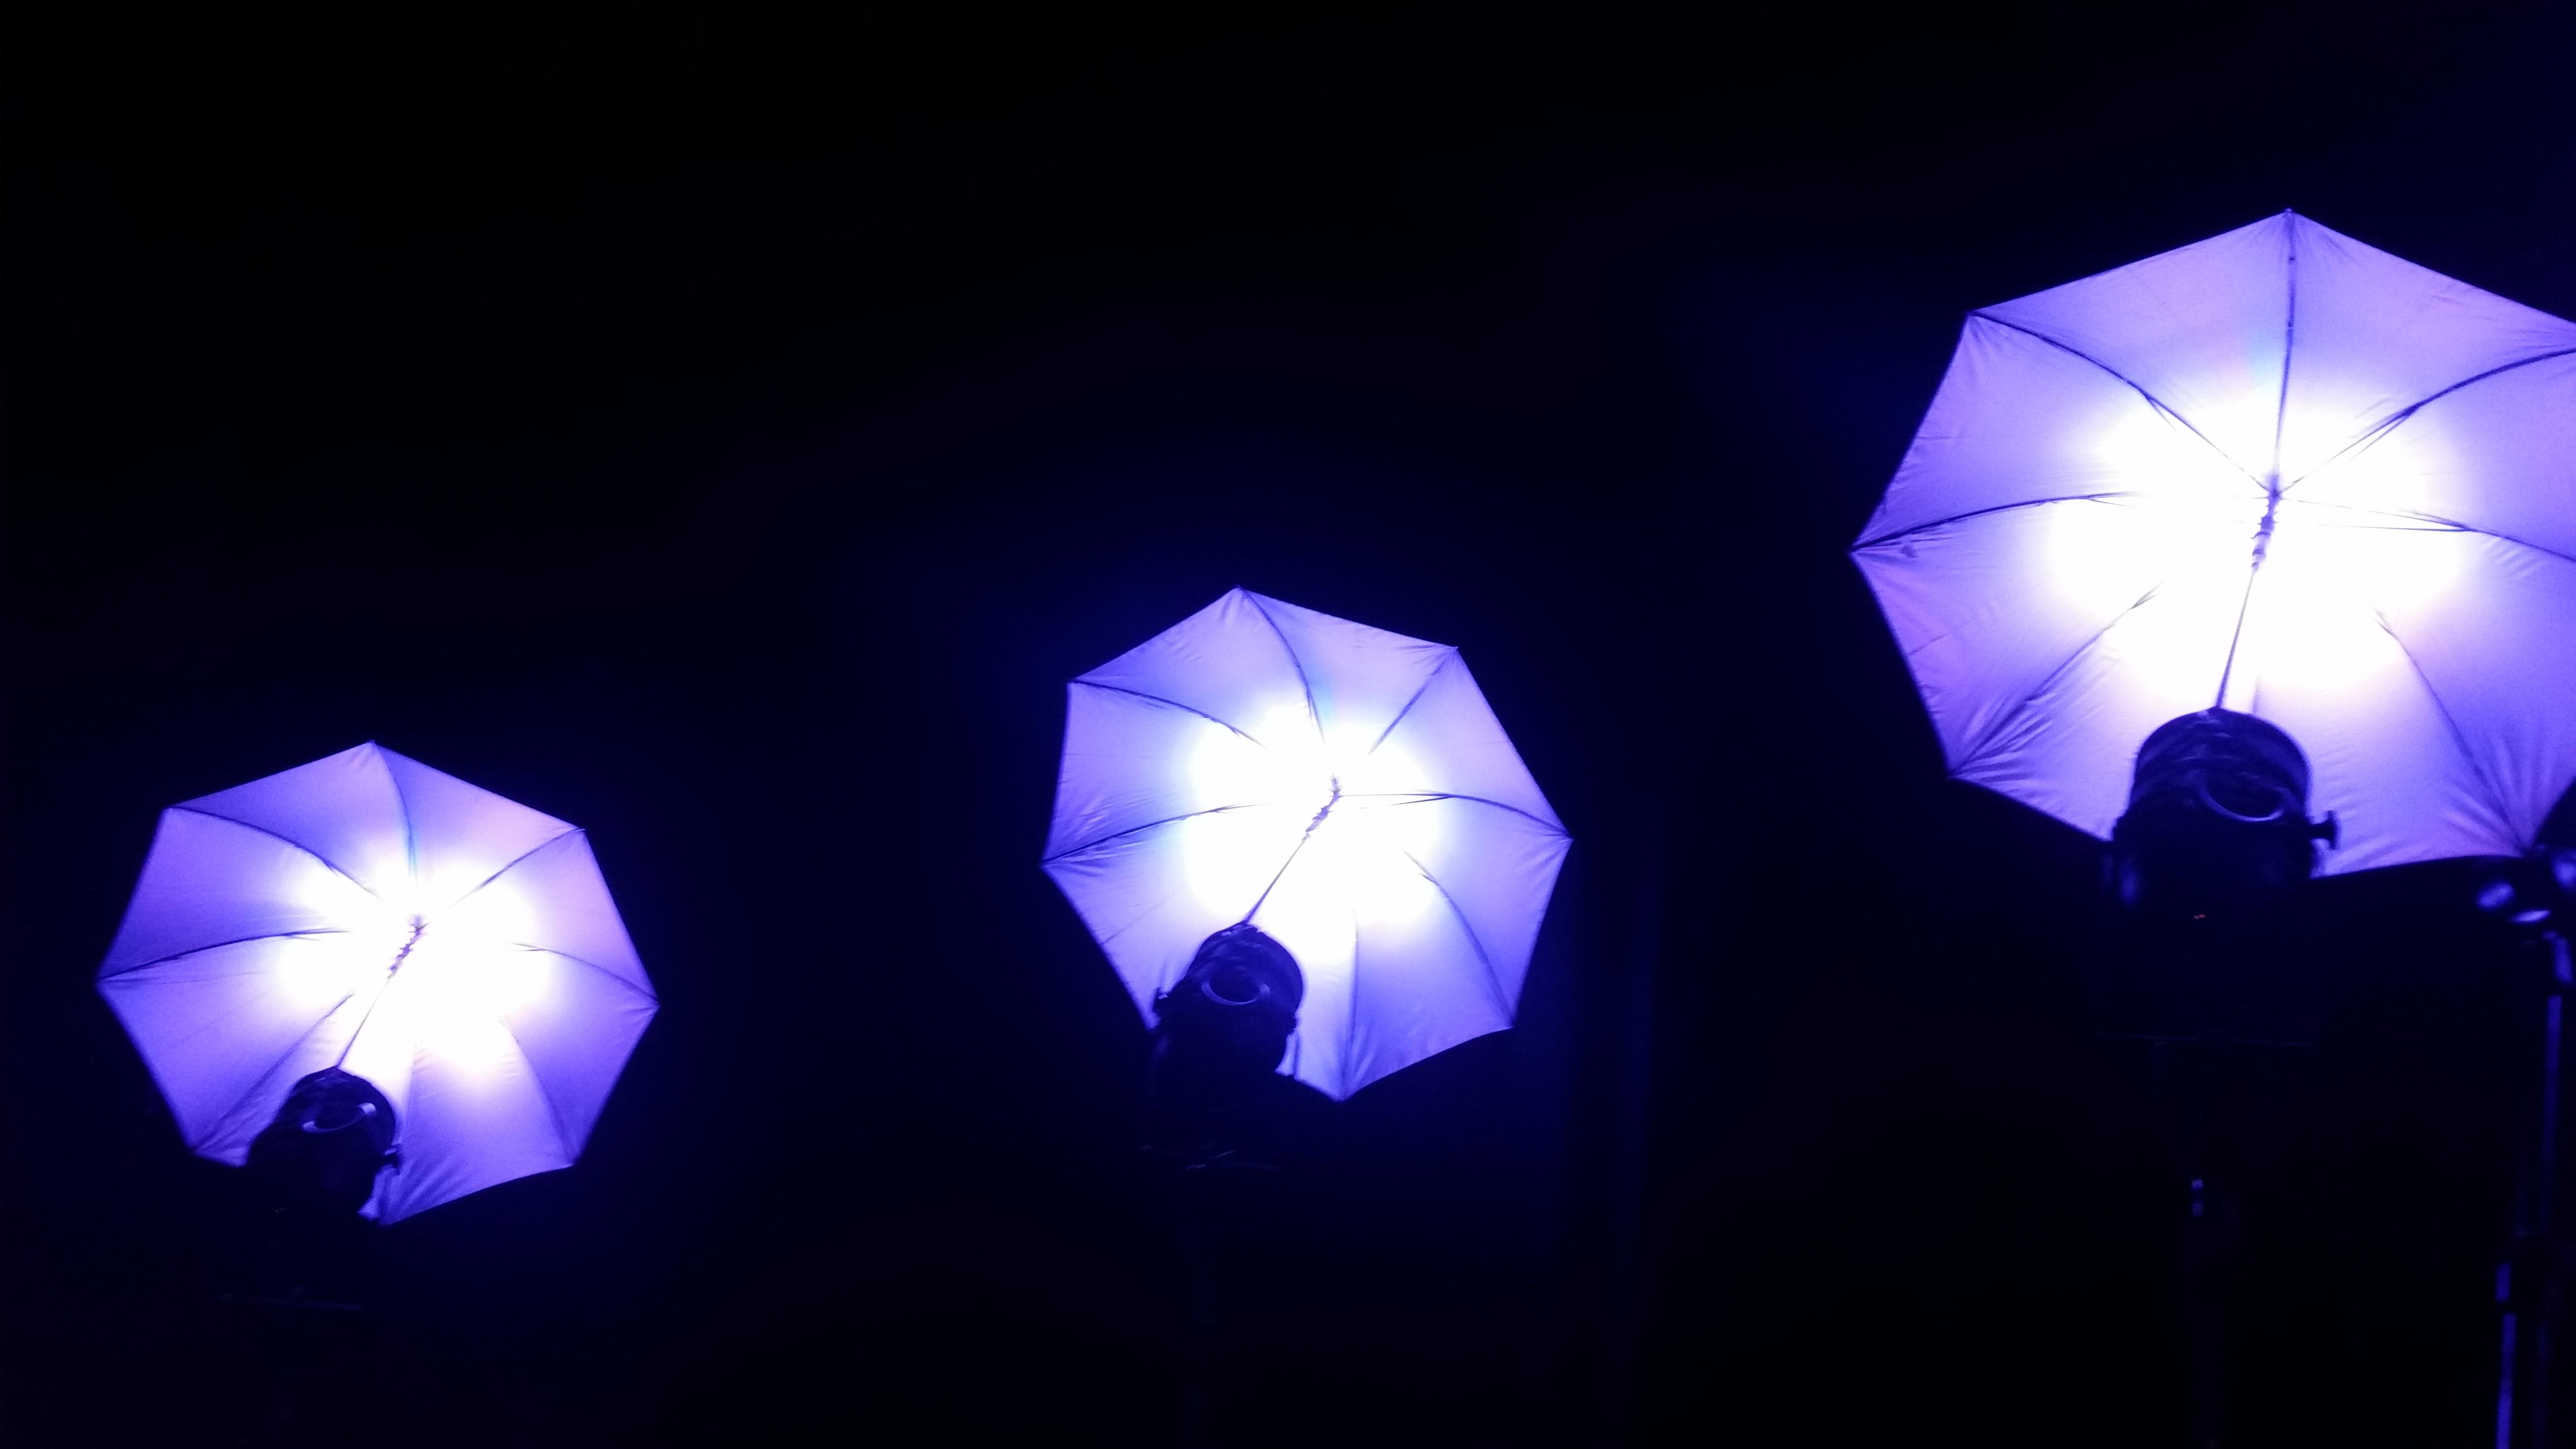 Neue LED Schirme als Designelemente 9